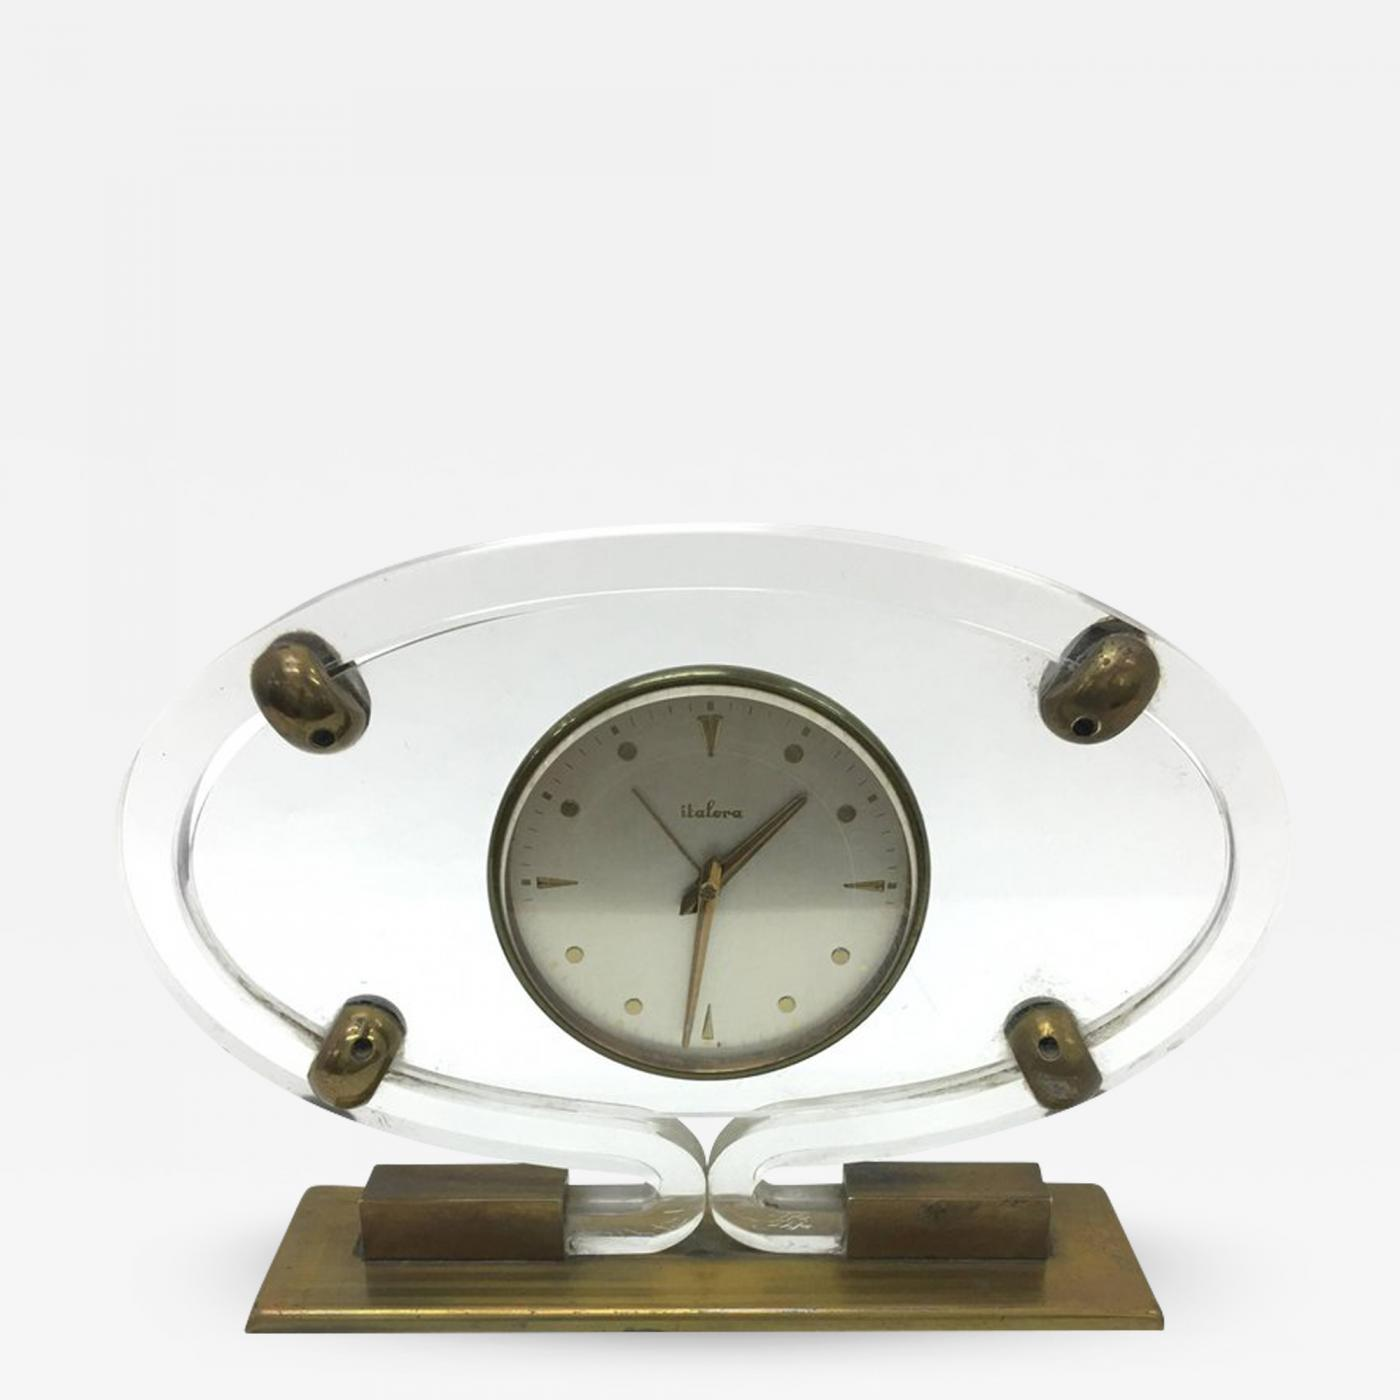 Mid-Century Modern Italian Plexiglass and brass Table Clock by Italora 1950